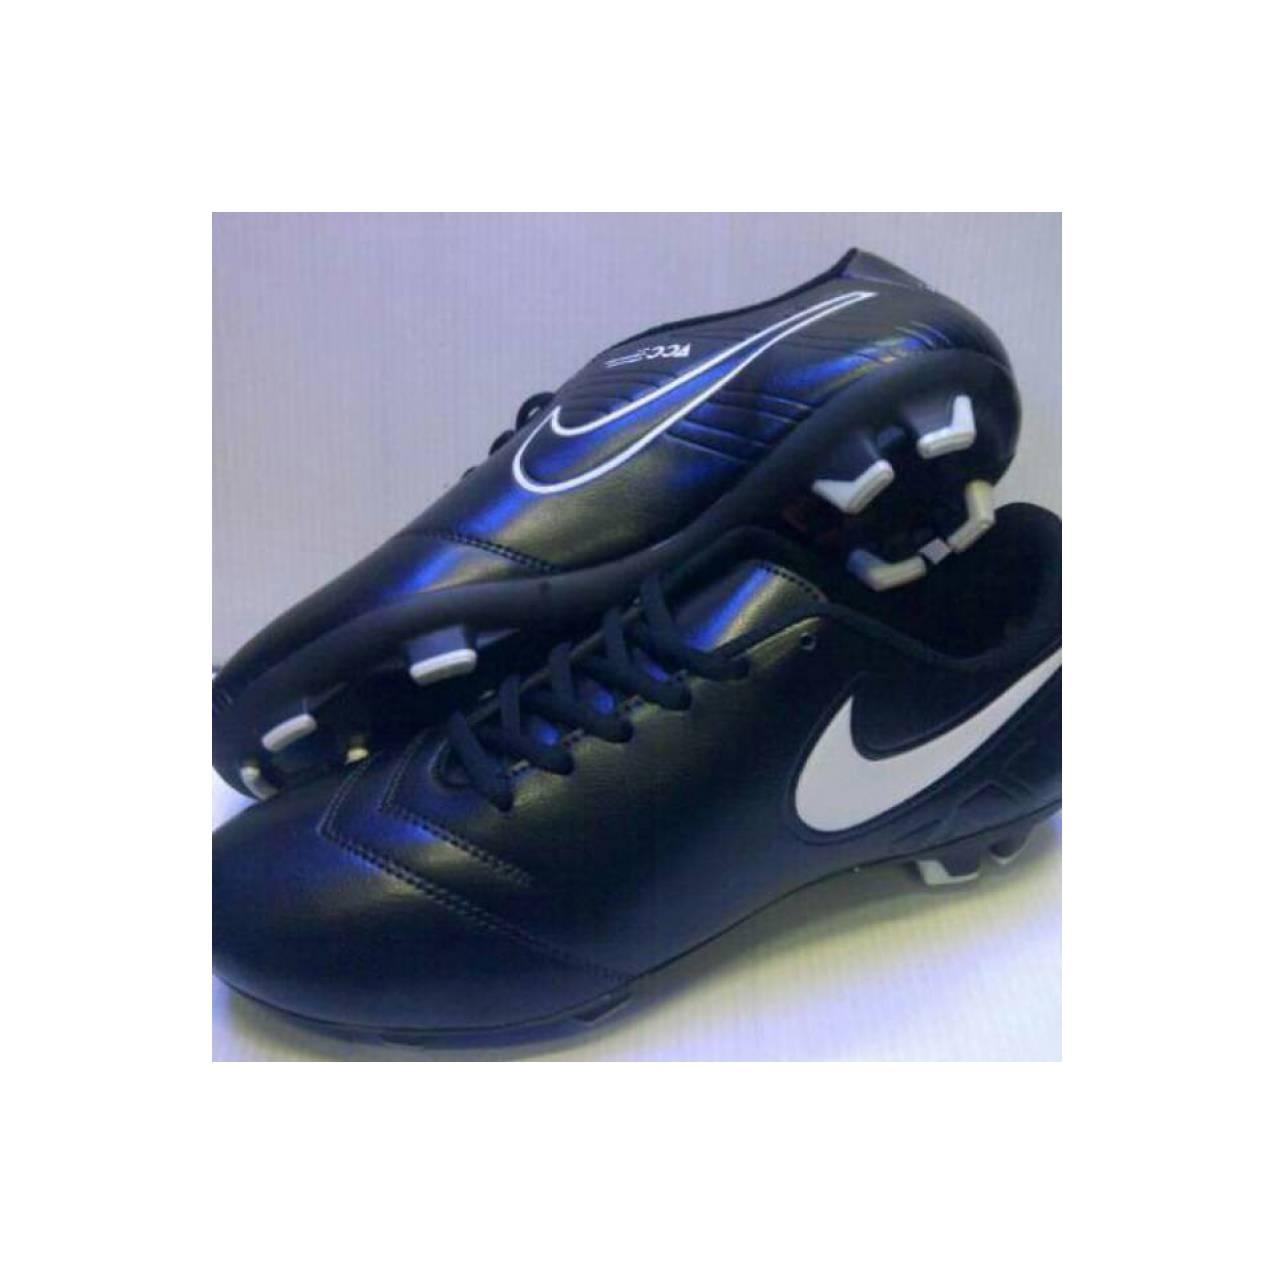 Sepatu Futsal Nike Tempo Hitam - Kualitas KW Super